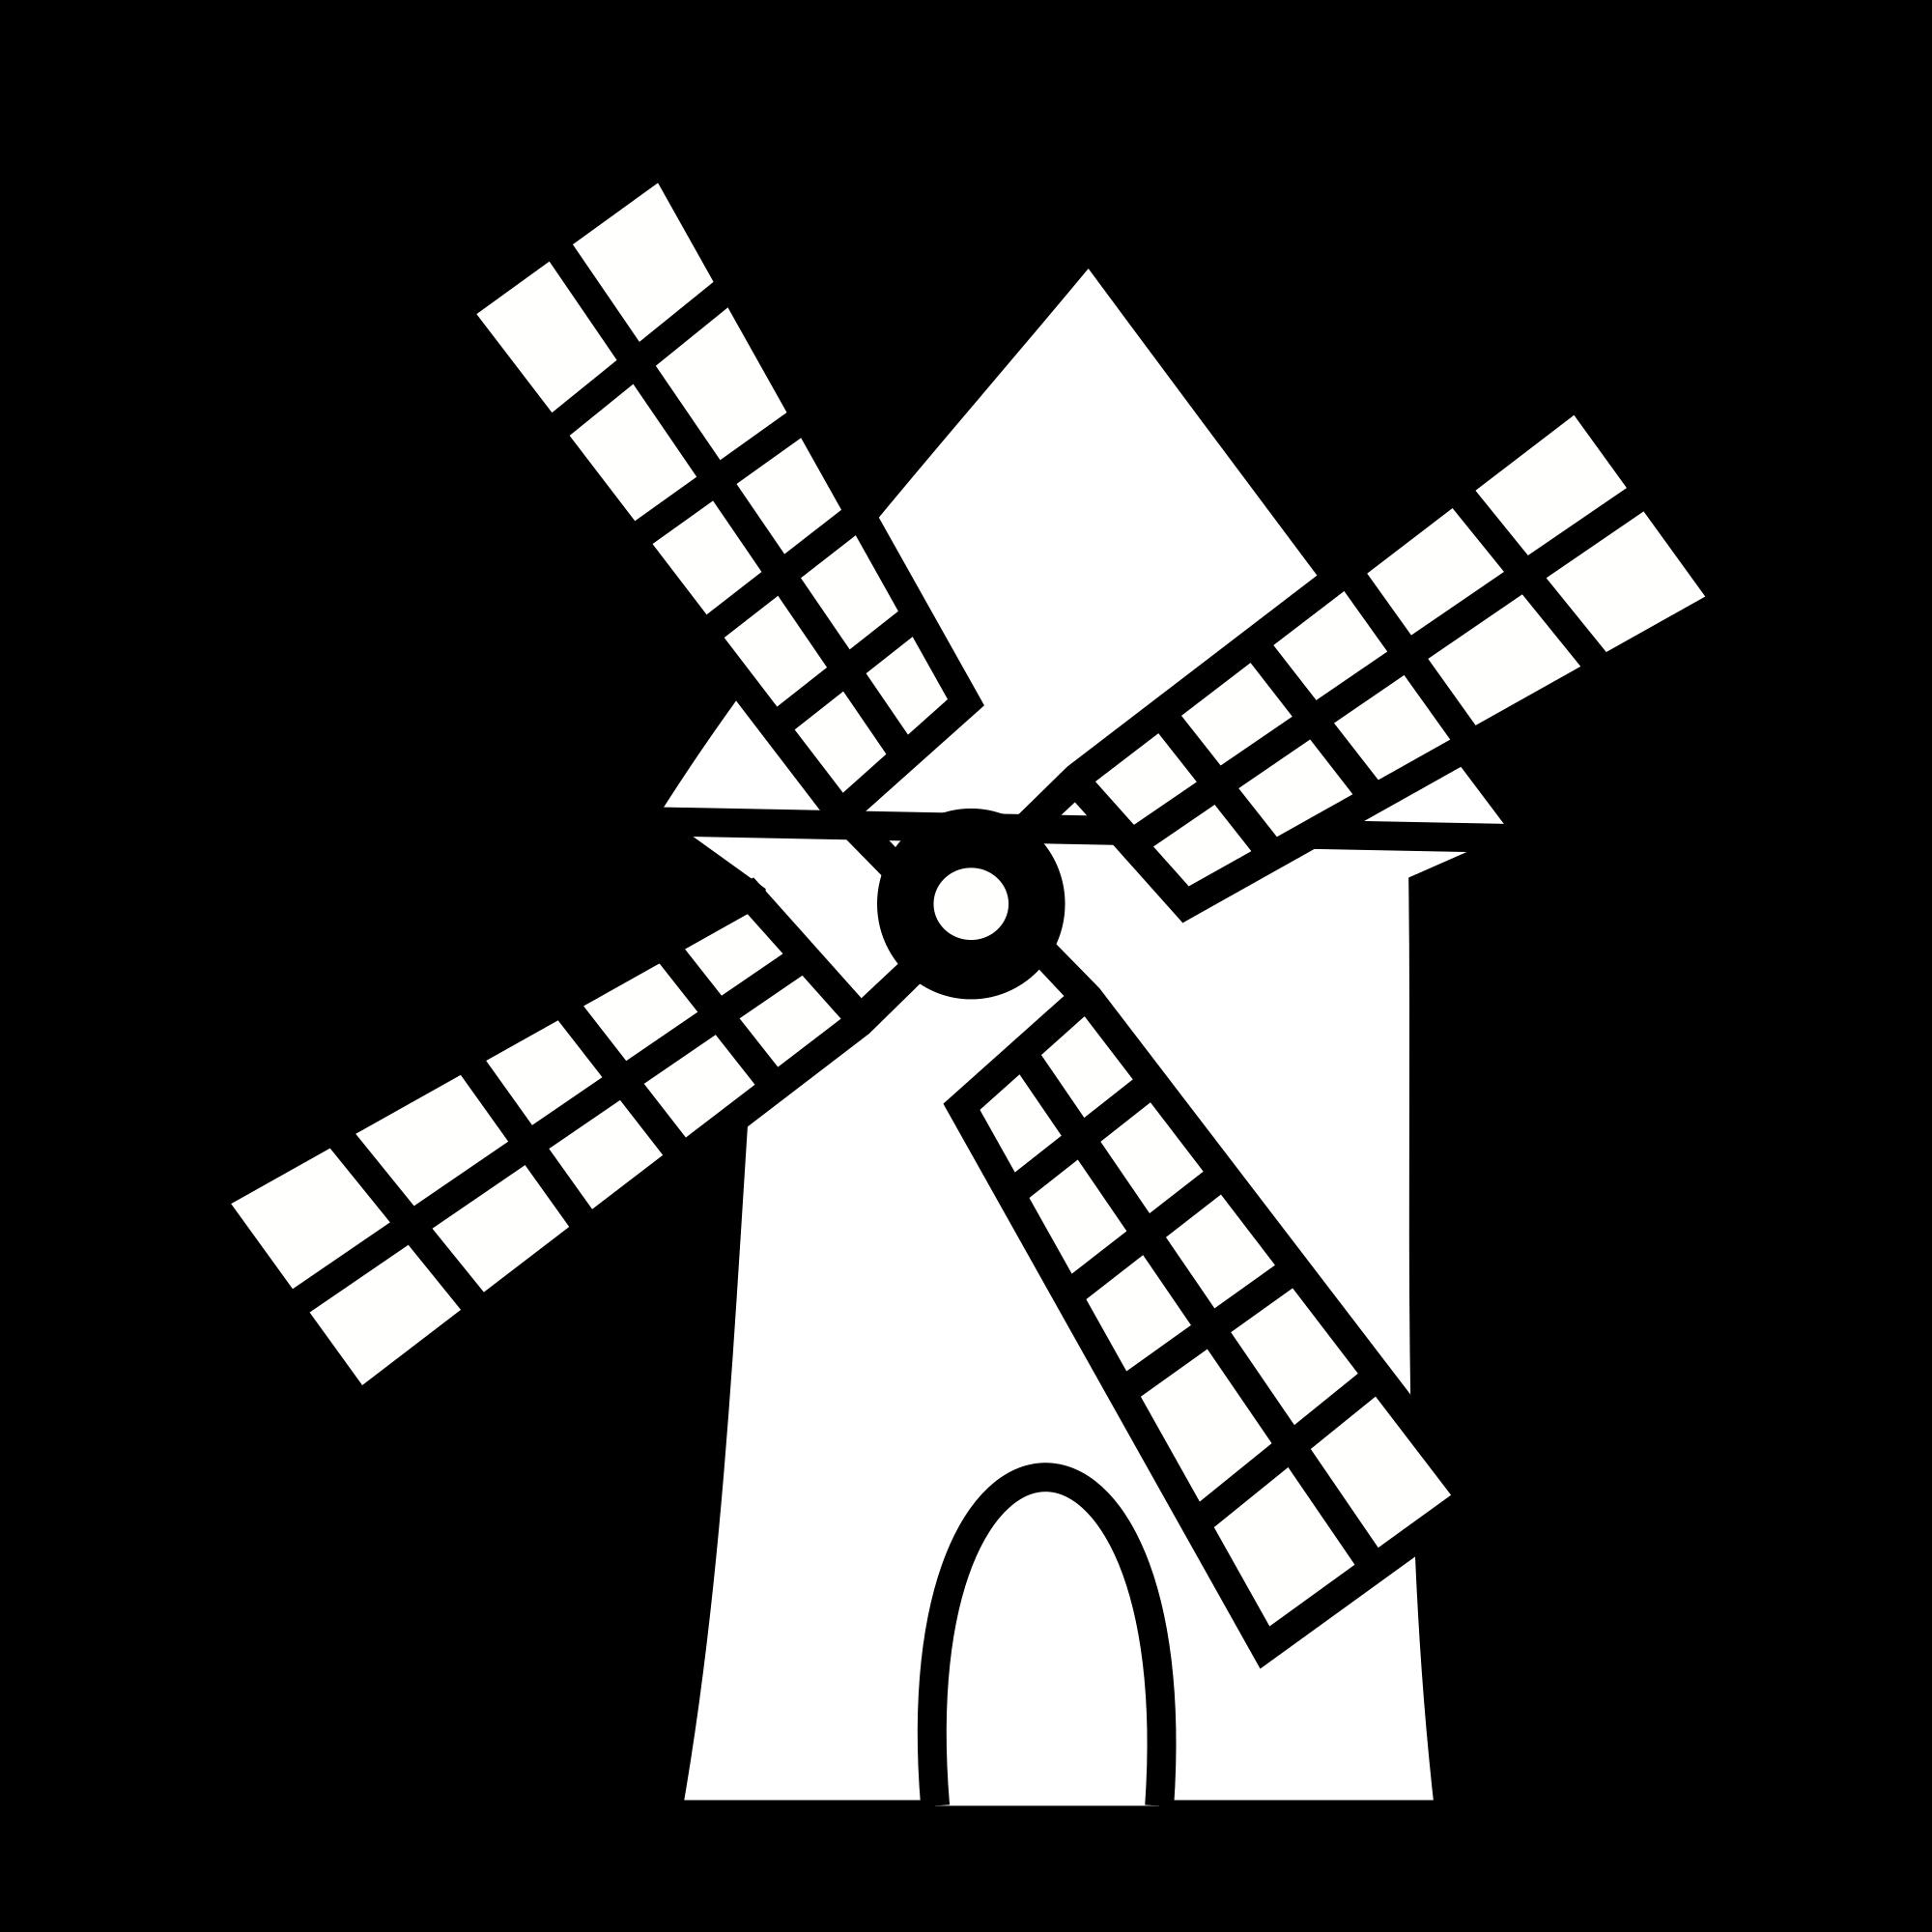 2000px Heraldique Meuble Moulin Svg Png 2000 2000 Molinos De Viento Viento Dibujo Don Quijote Dibujo